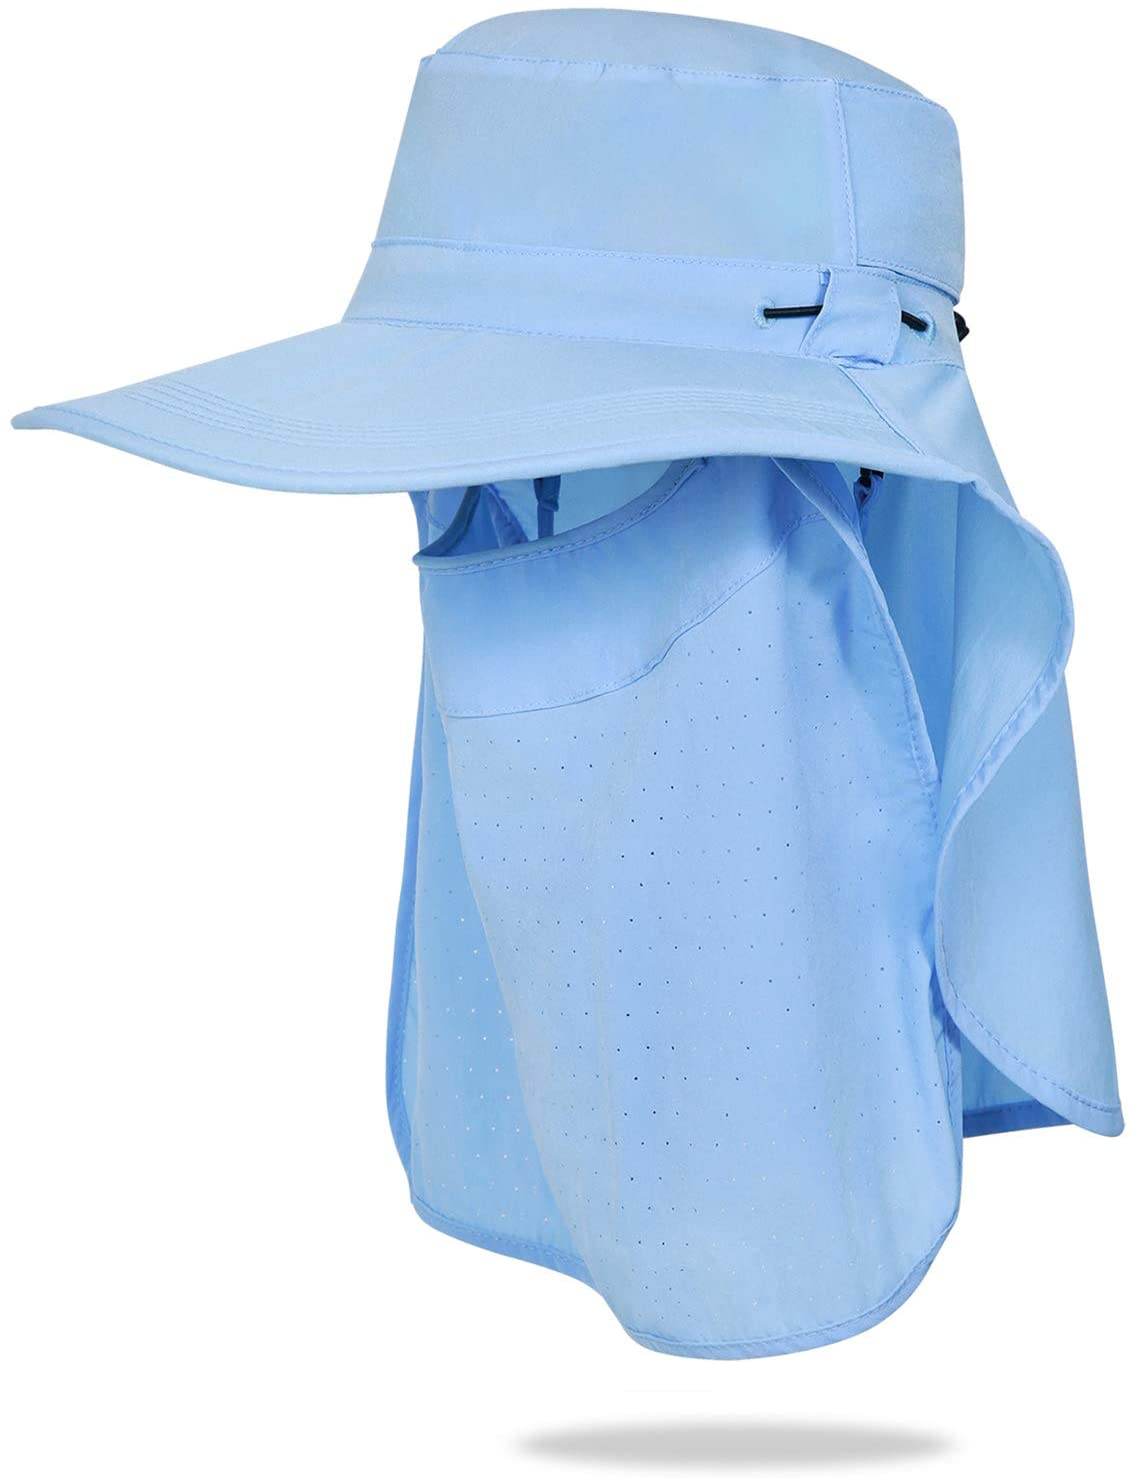 Pumkeril Fishing Sun Hat with Face Cover Neck Flap Unisex Wide Brim UPF 50+ Adjustable Visor Cap